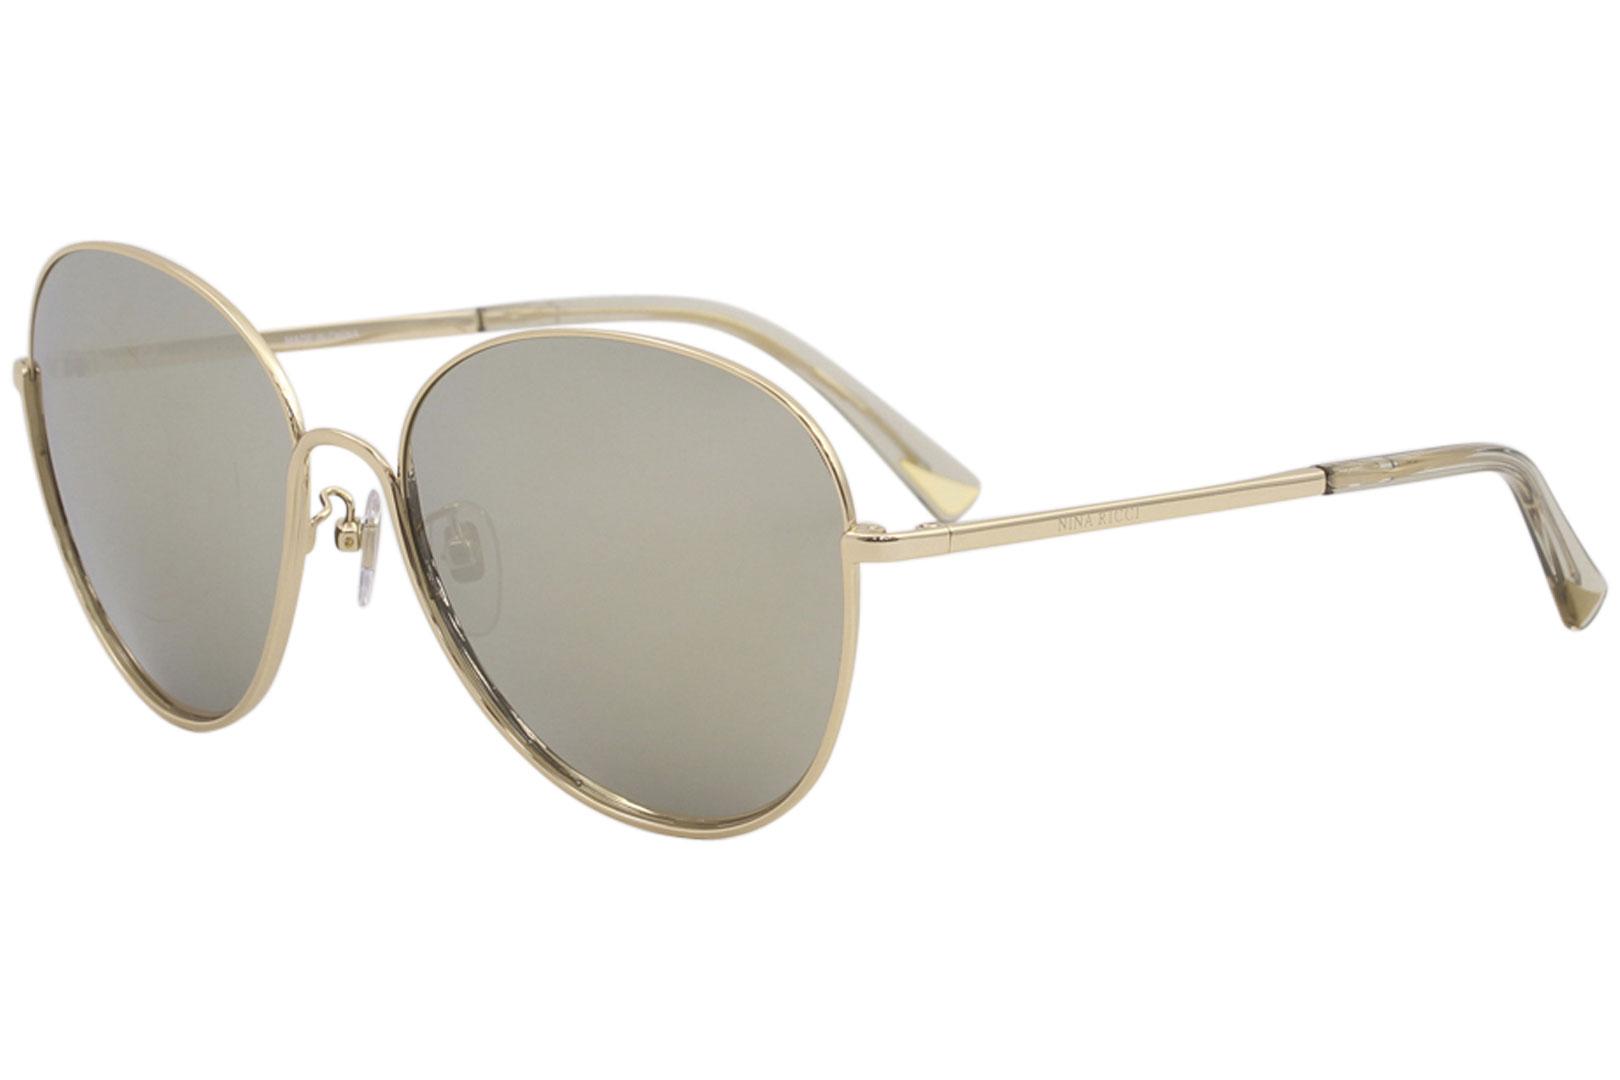 644b09cb63 Nina Ricci Women s SNR061 SNR 061 300G Shiny Gold Fashion Square ...